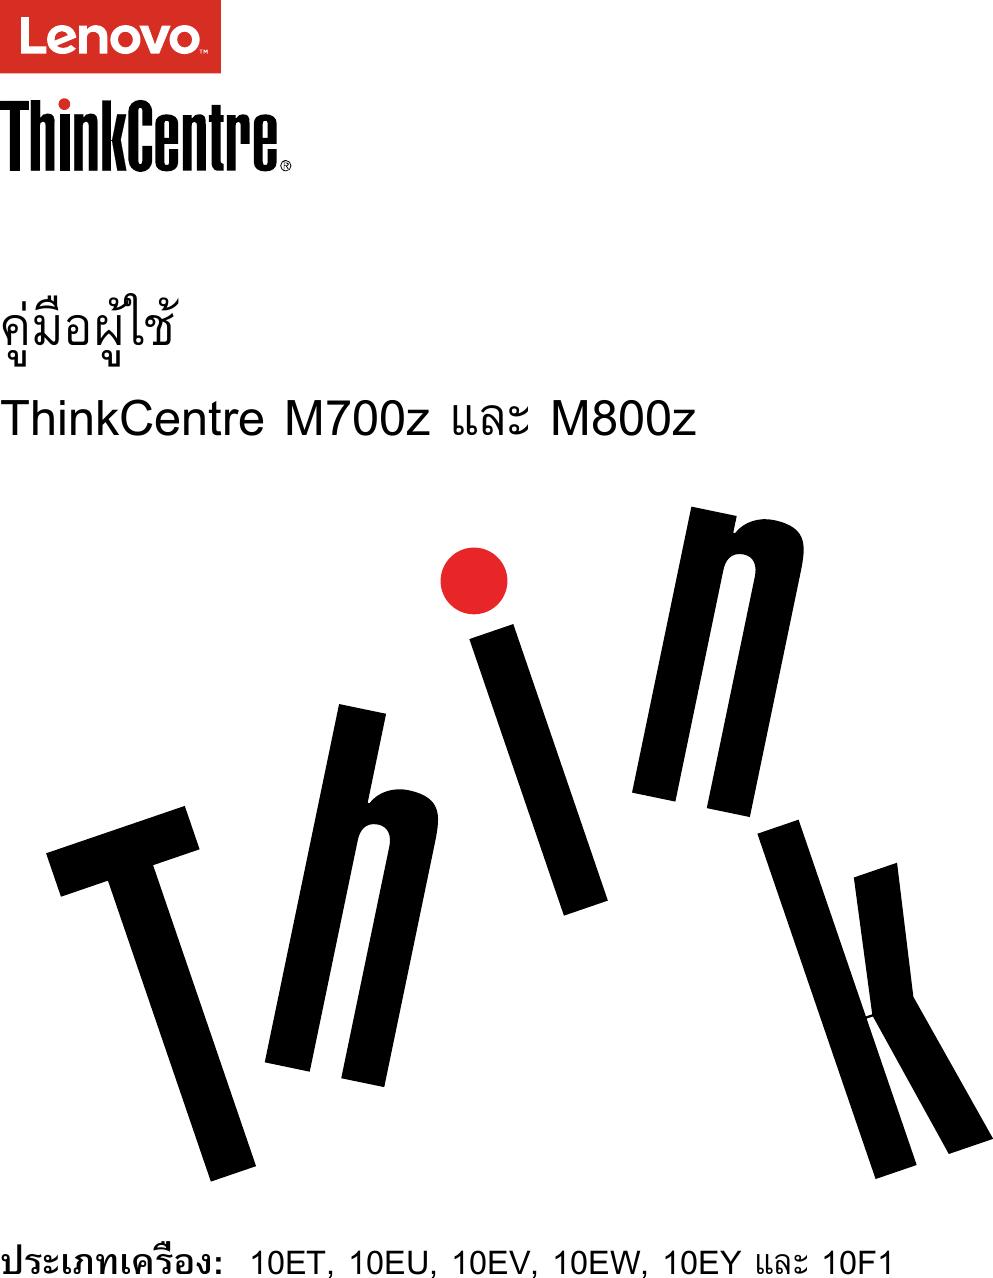 Lenovo M700Z M800Z Ug Th User Manual (Thai) Guide Think